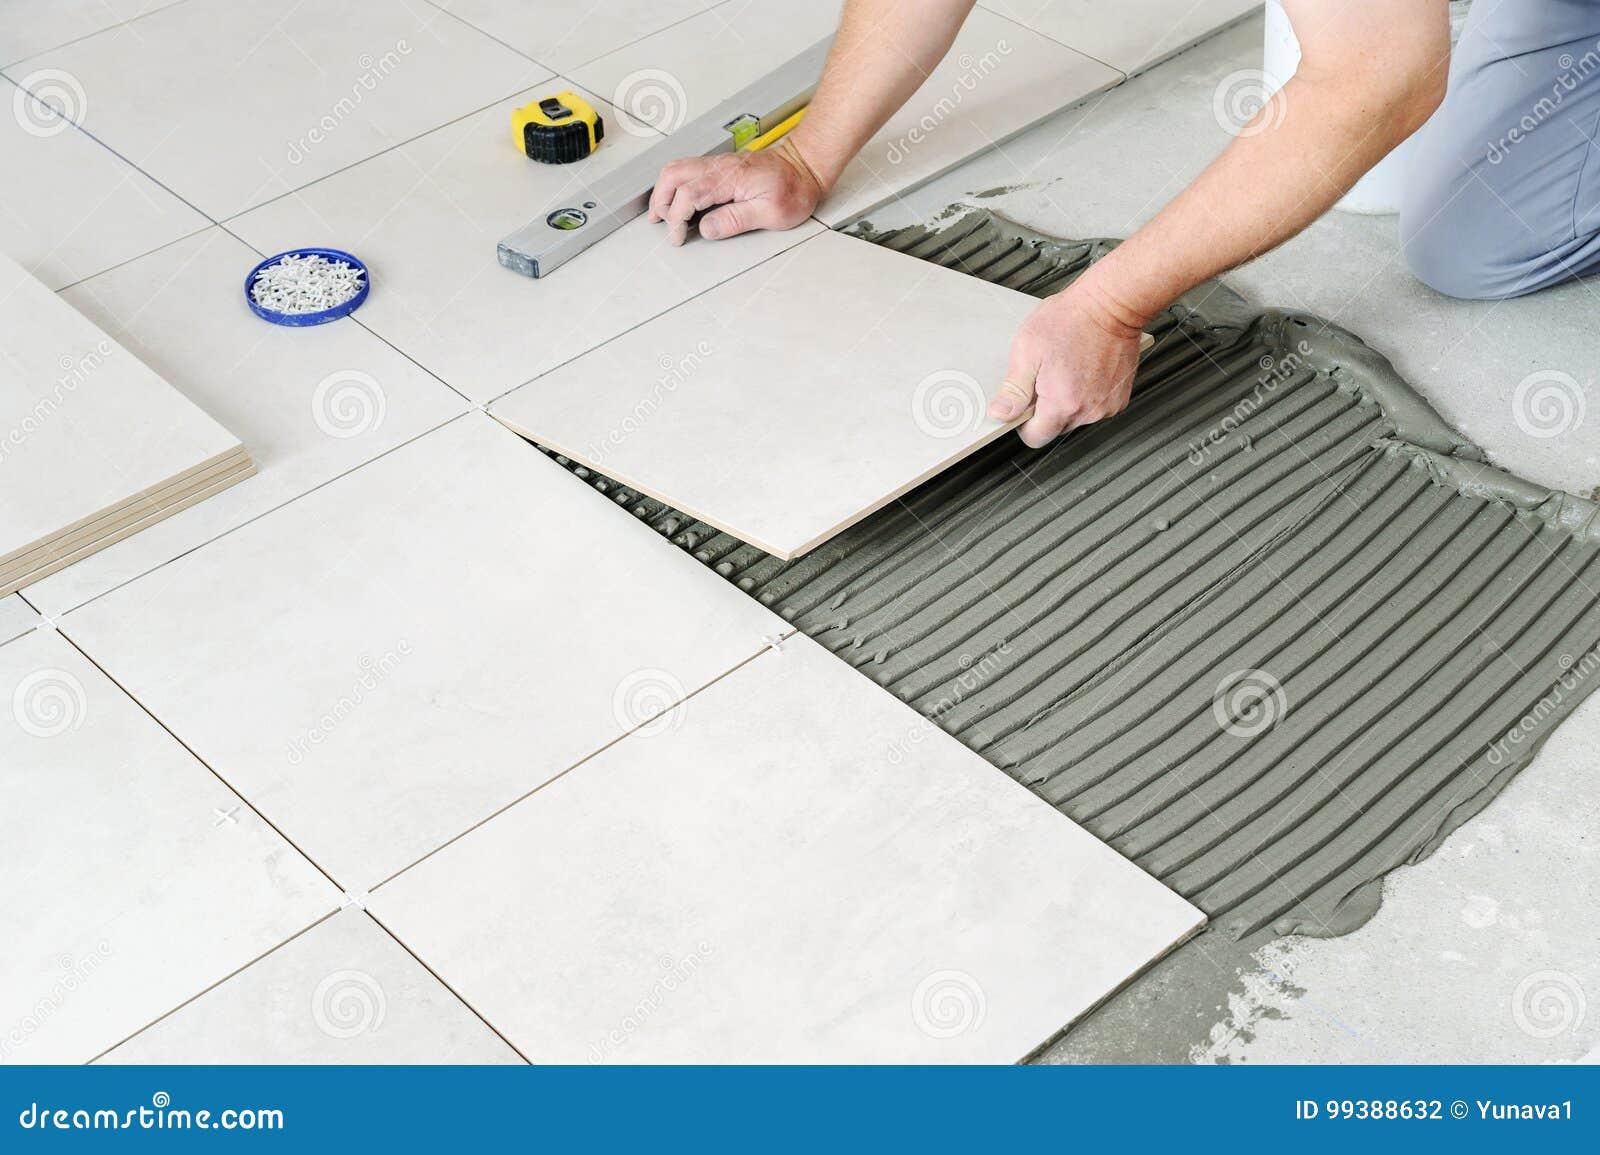 Laying Ceramic Tiles Stock Photo Image Of Hand Adhesive 99388632